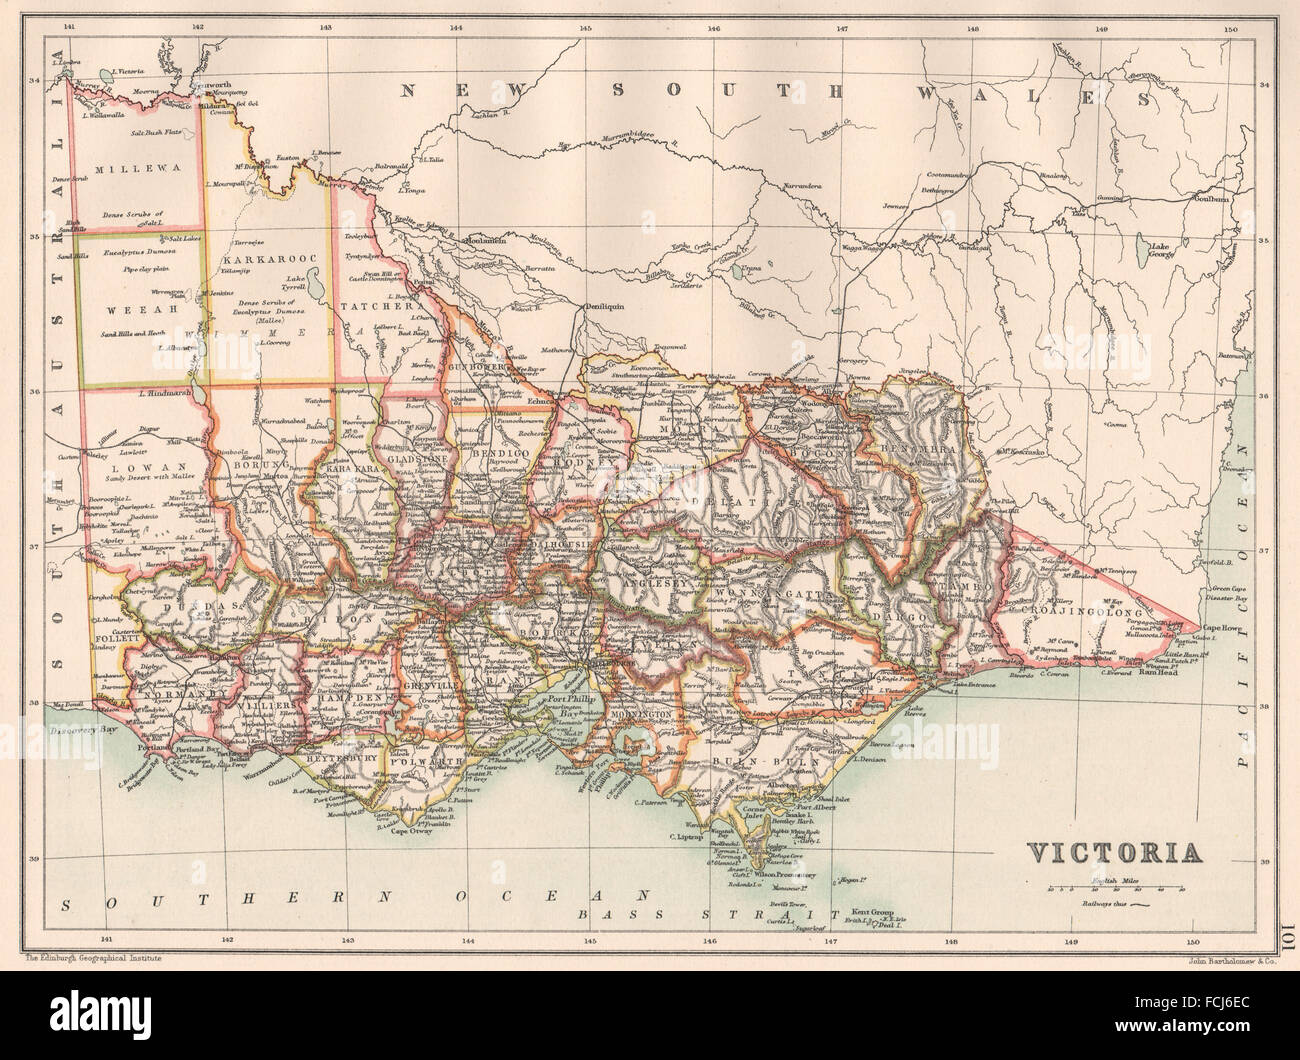 Victoria State Australia Map.Victoria State Map Showing Counties Australia Bartholomew 1891